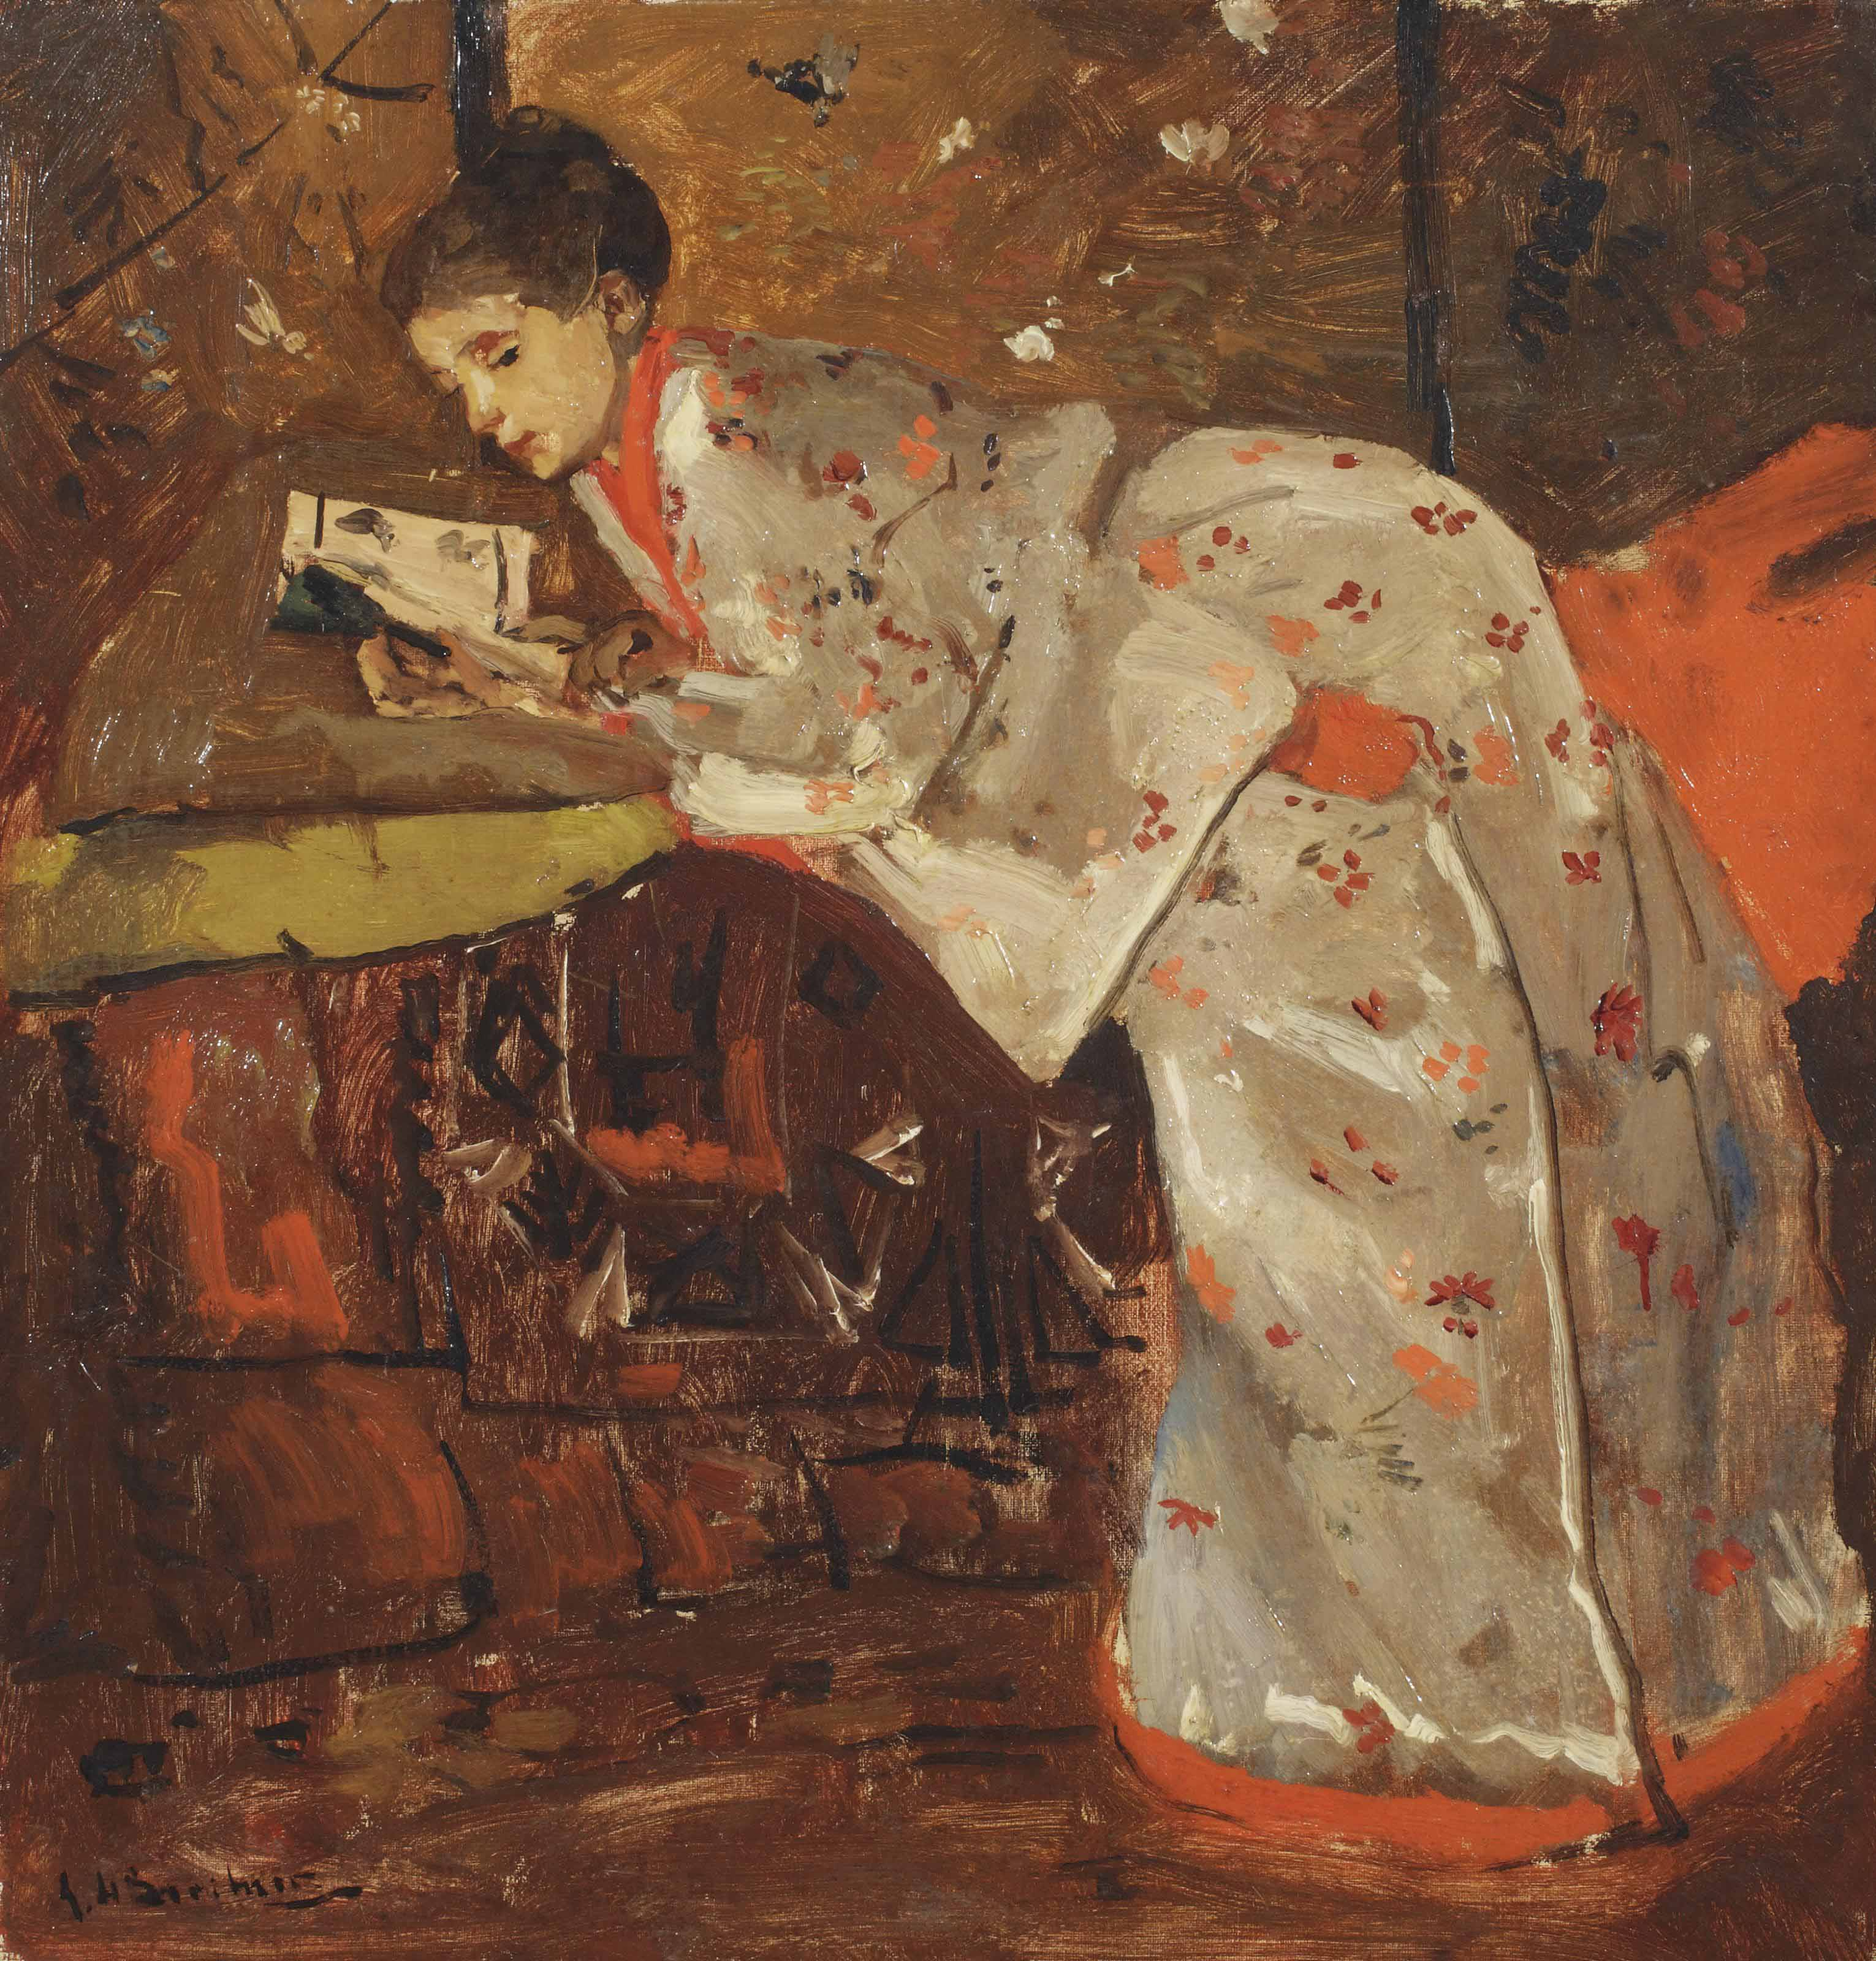 Vrouw in Japansche kimono (Geesje Kwak): girl in a white kimono